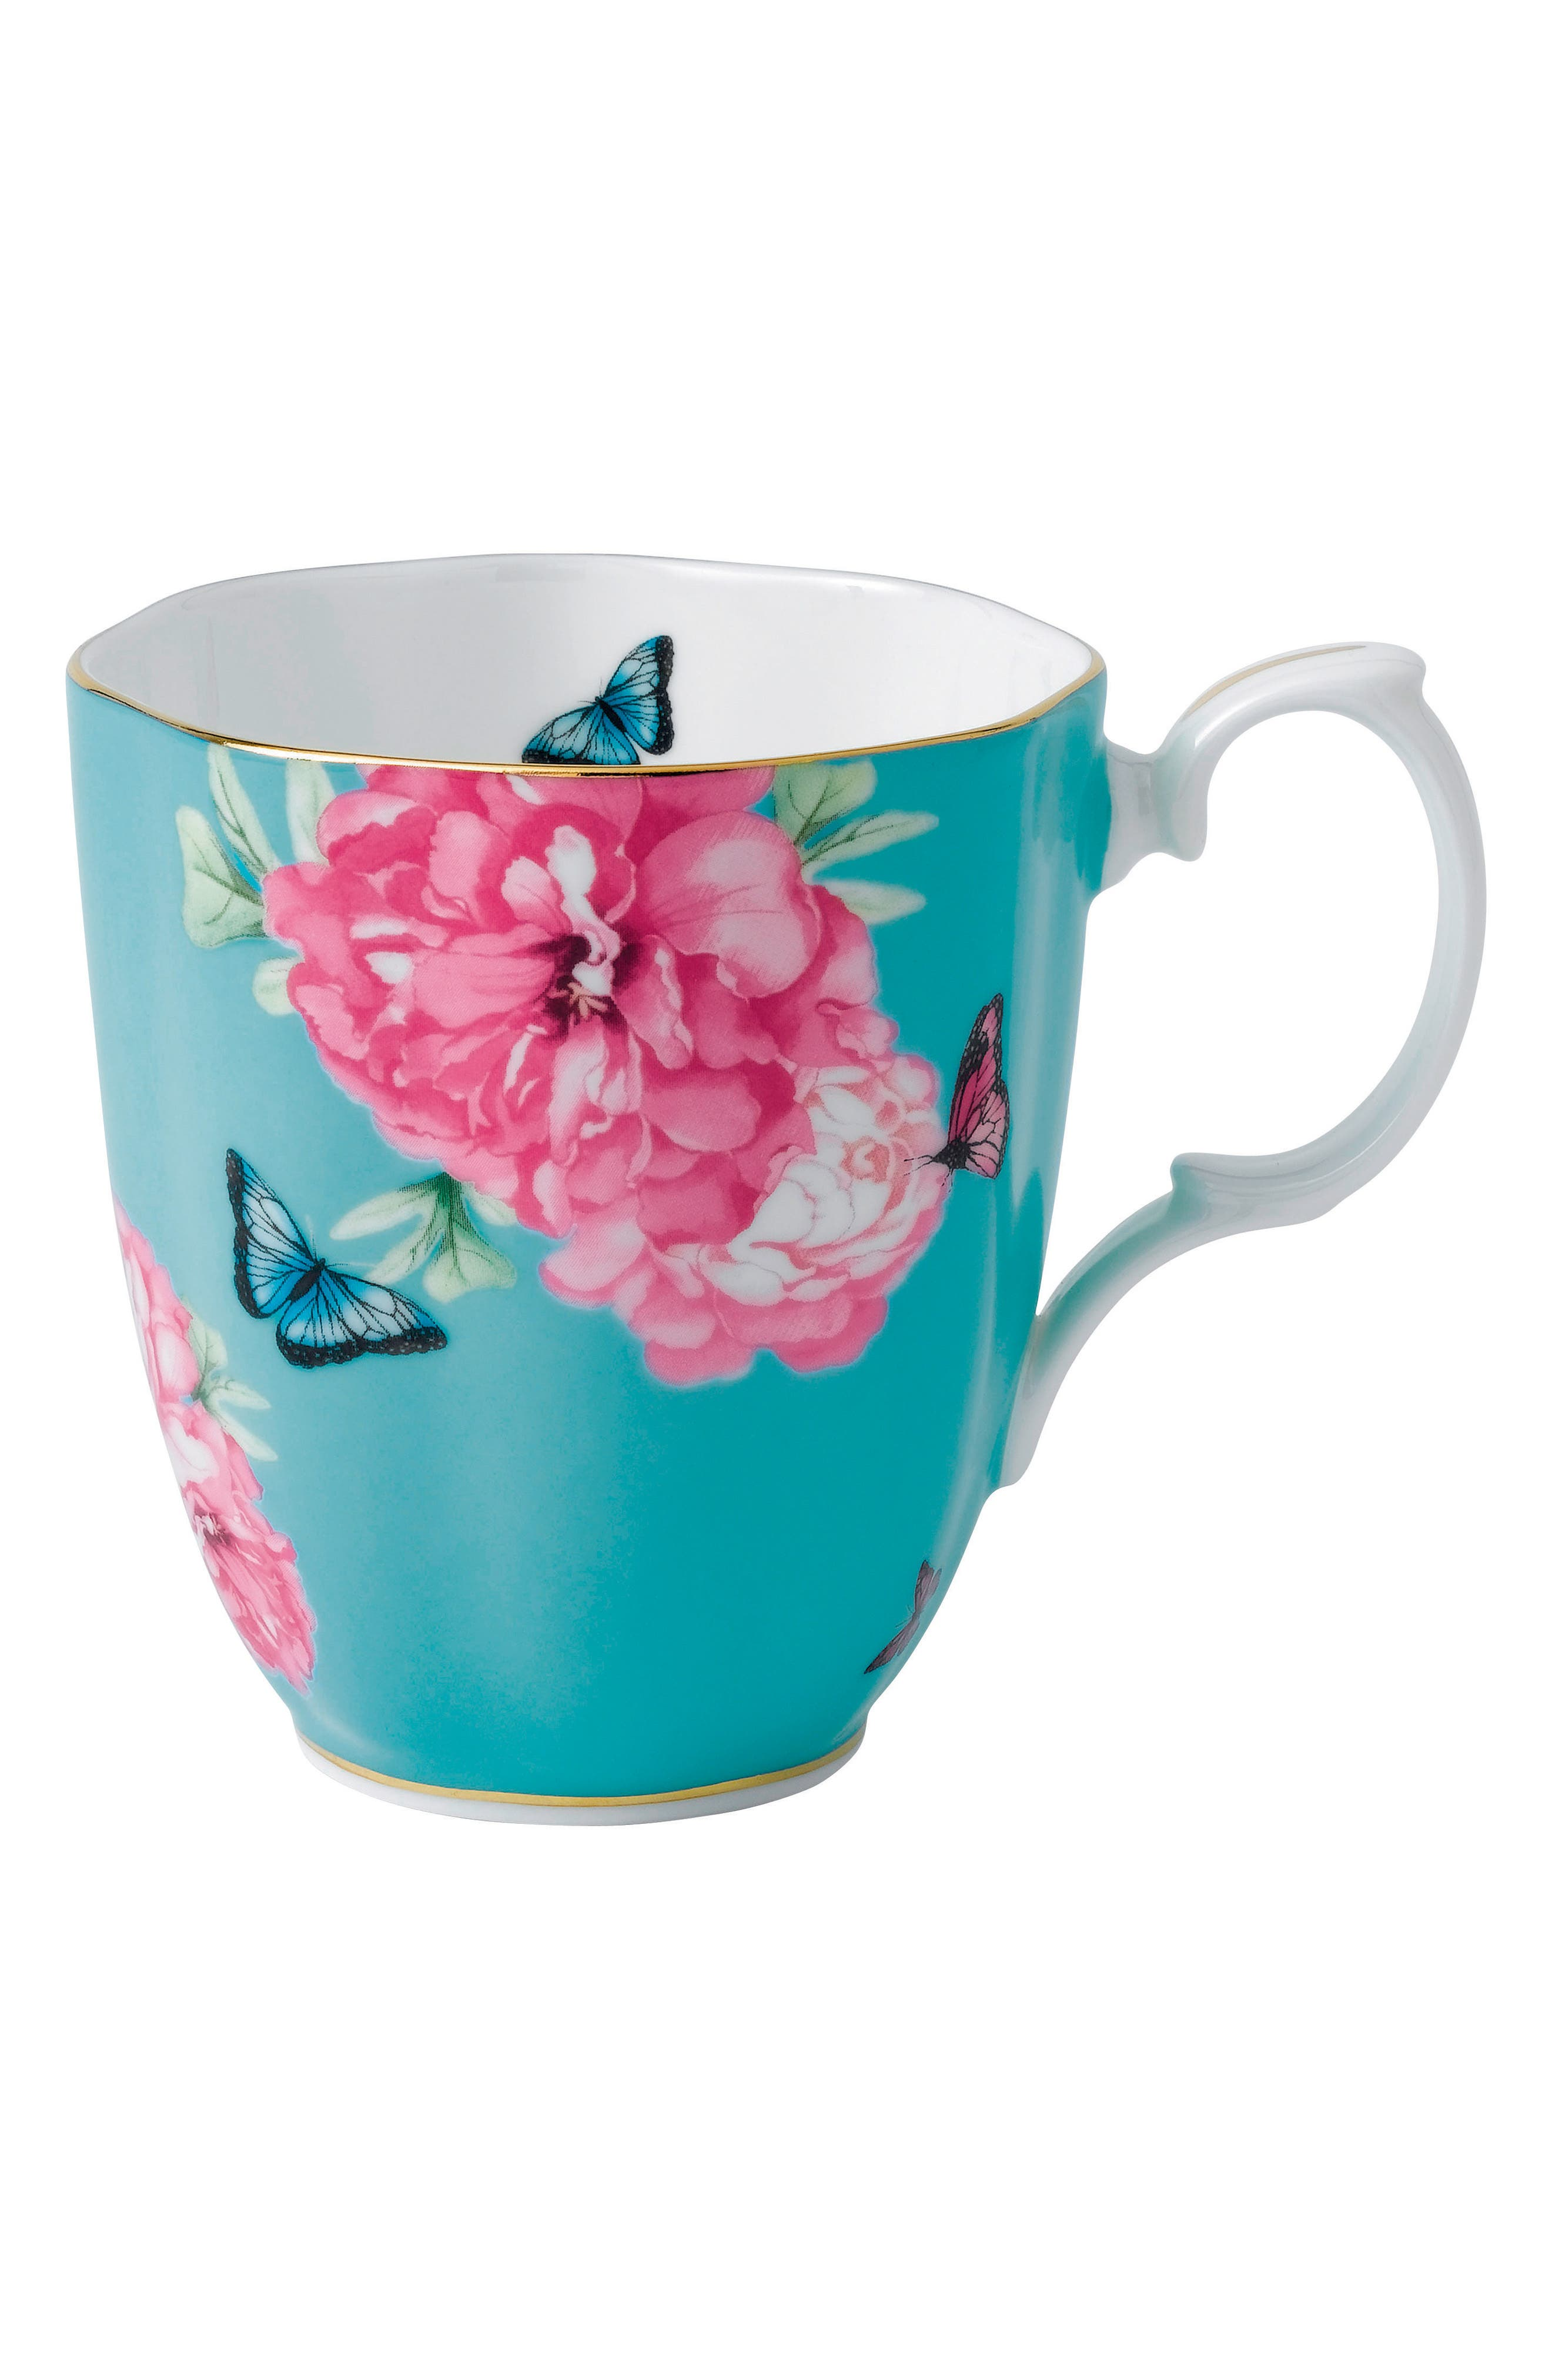 Miranda Kerr for Royal Albert Friendship Vintage Mug